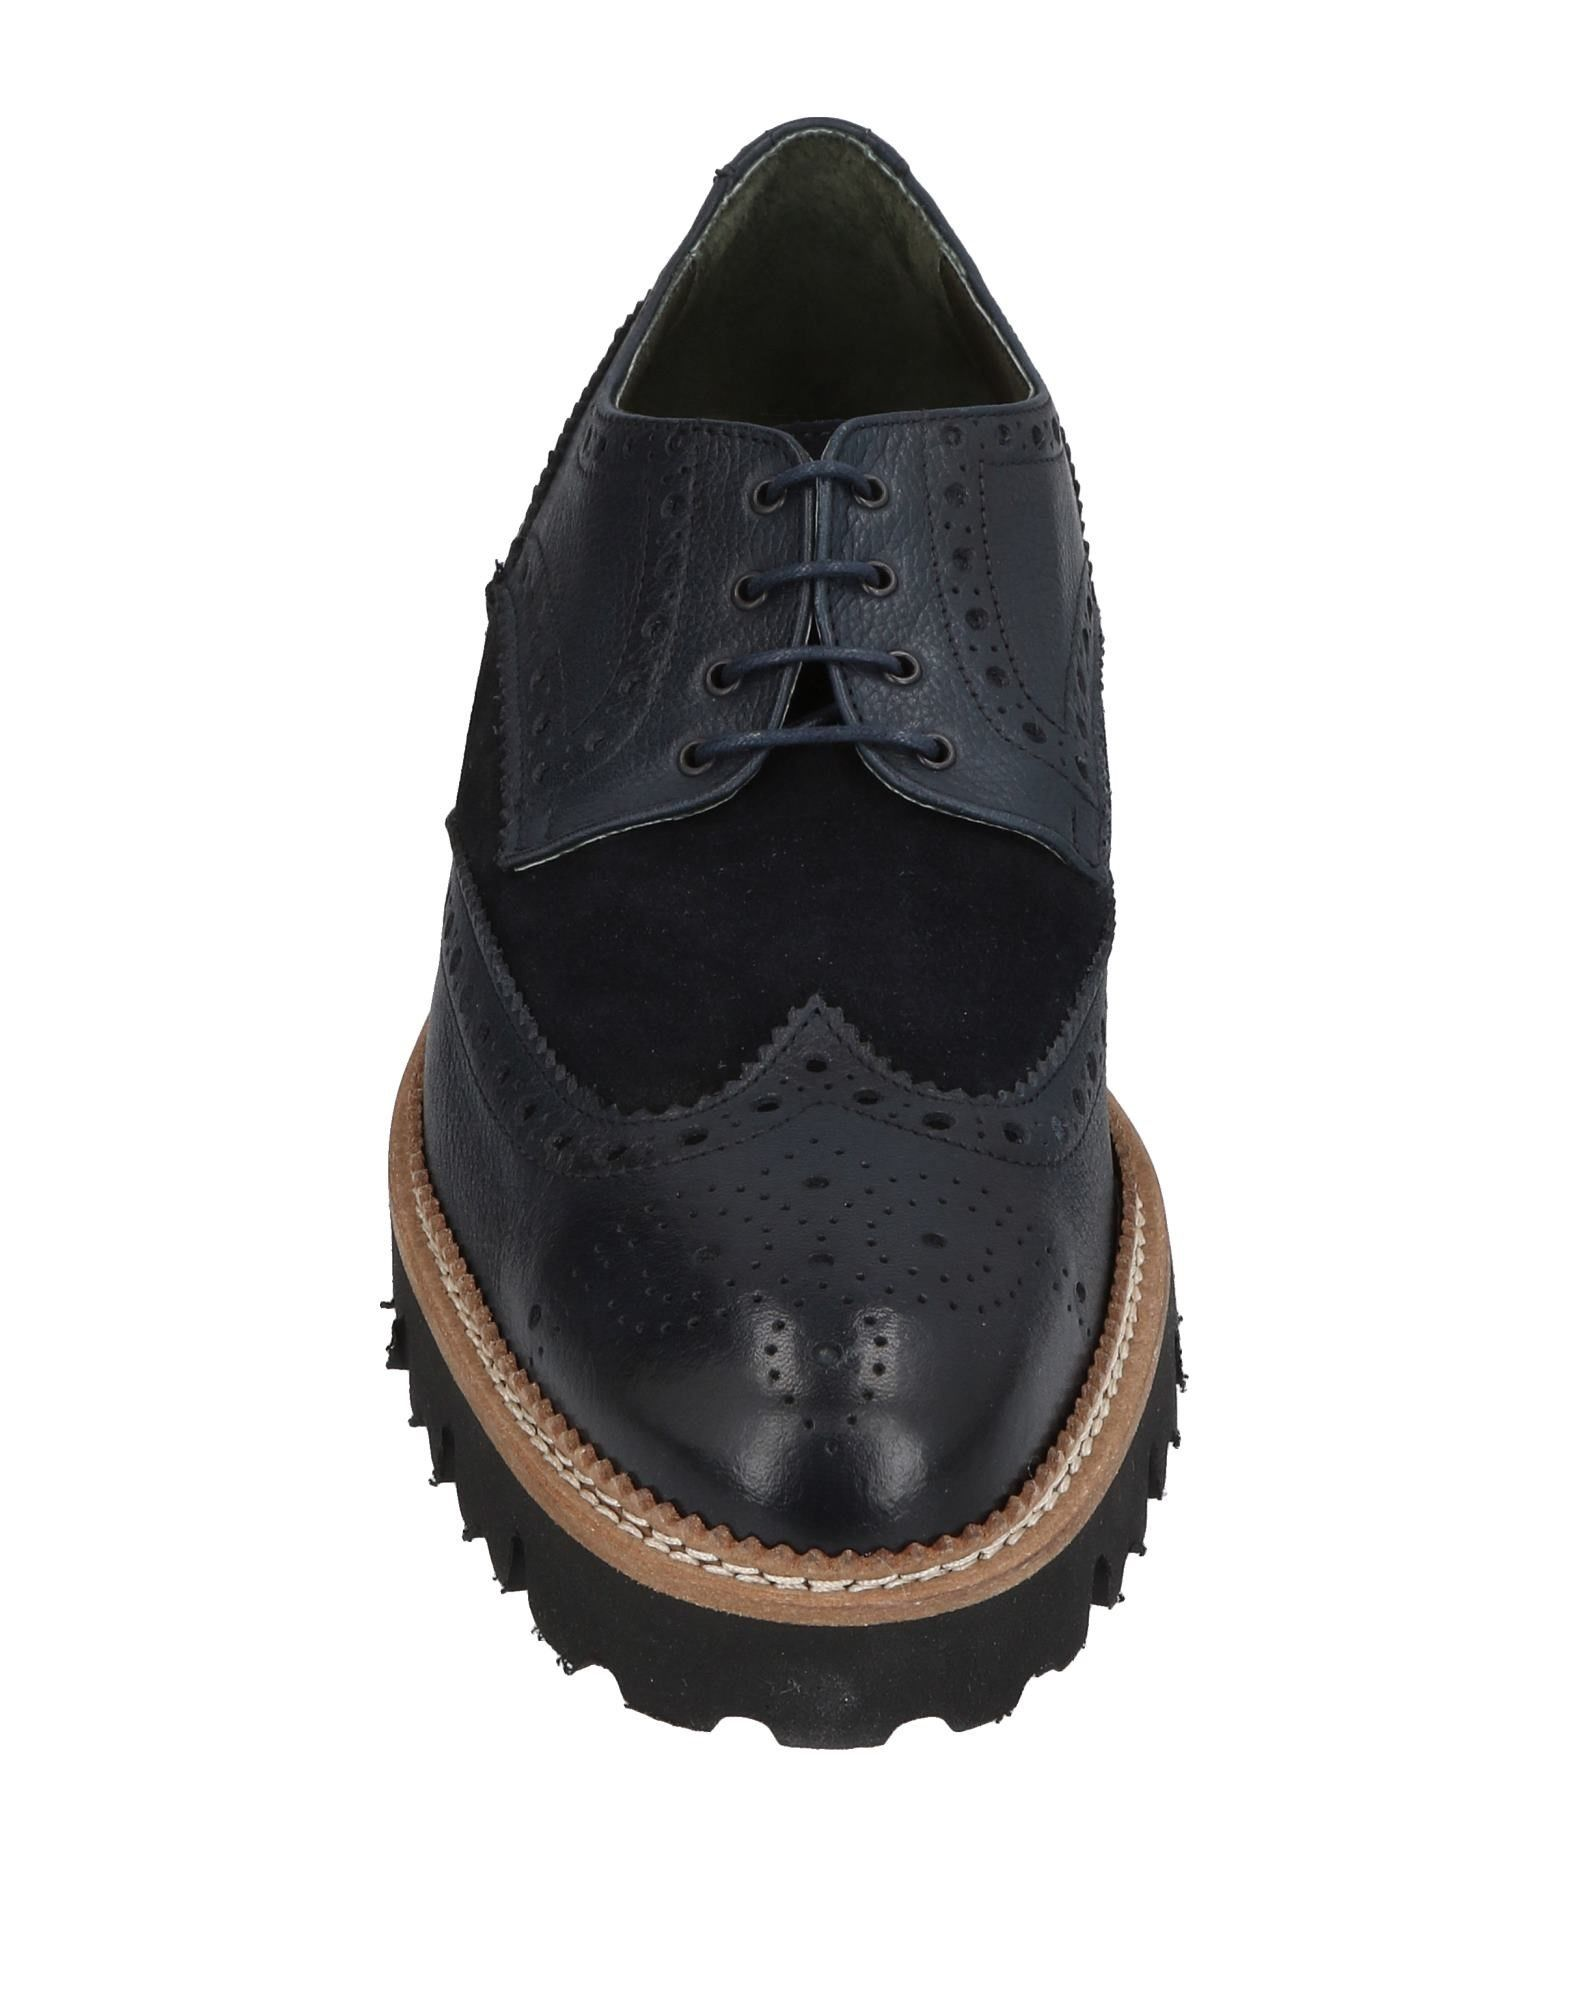 CHAUSSURES - Chaussures à lacetsBarbati csMLxZdeRg